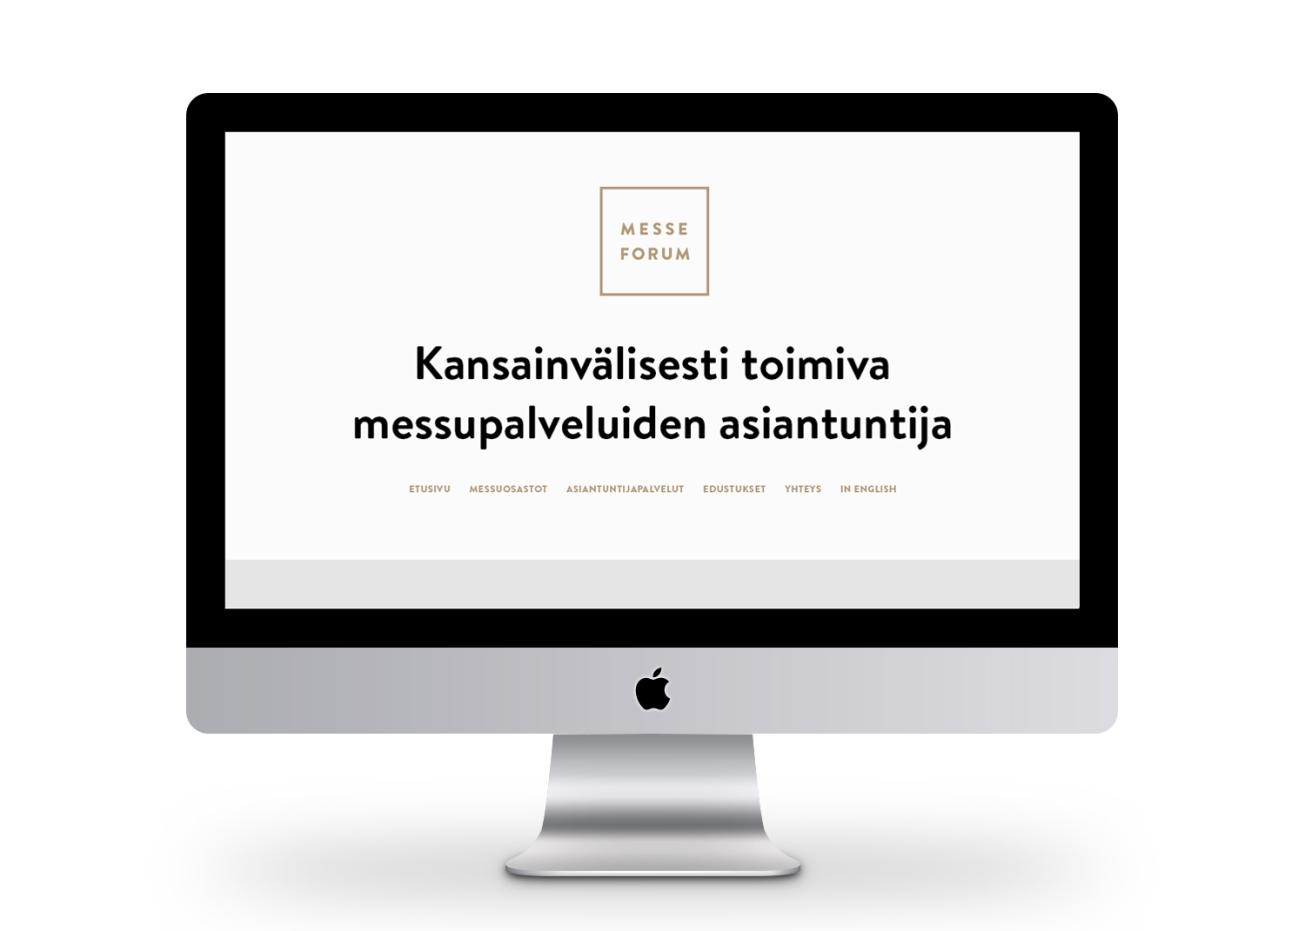 MESSEFORUM_etusivu_esille